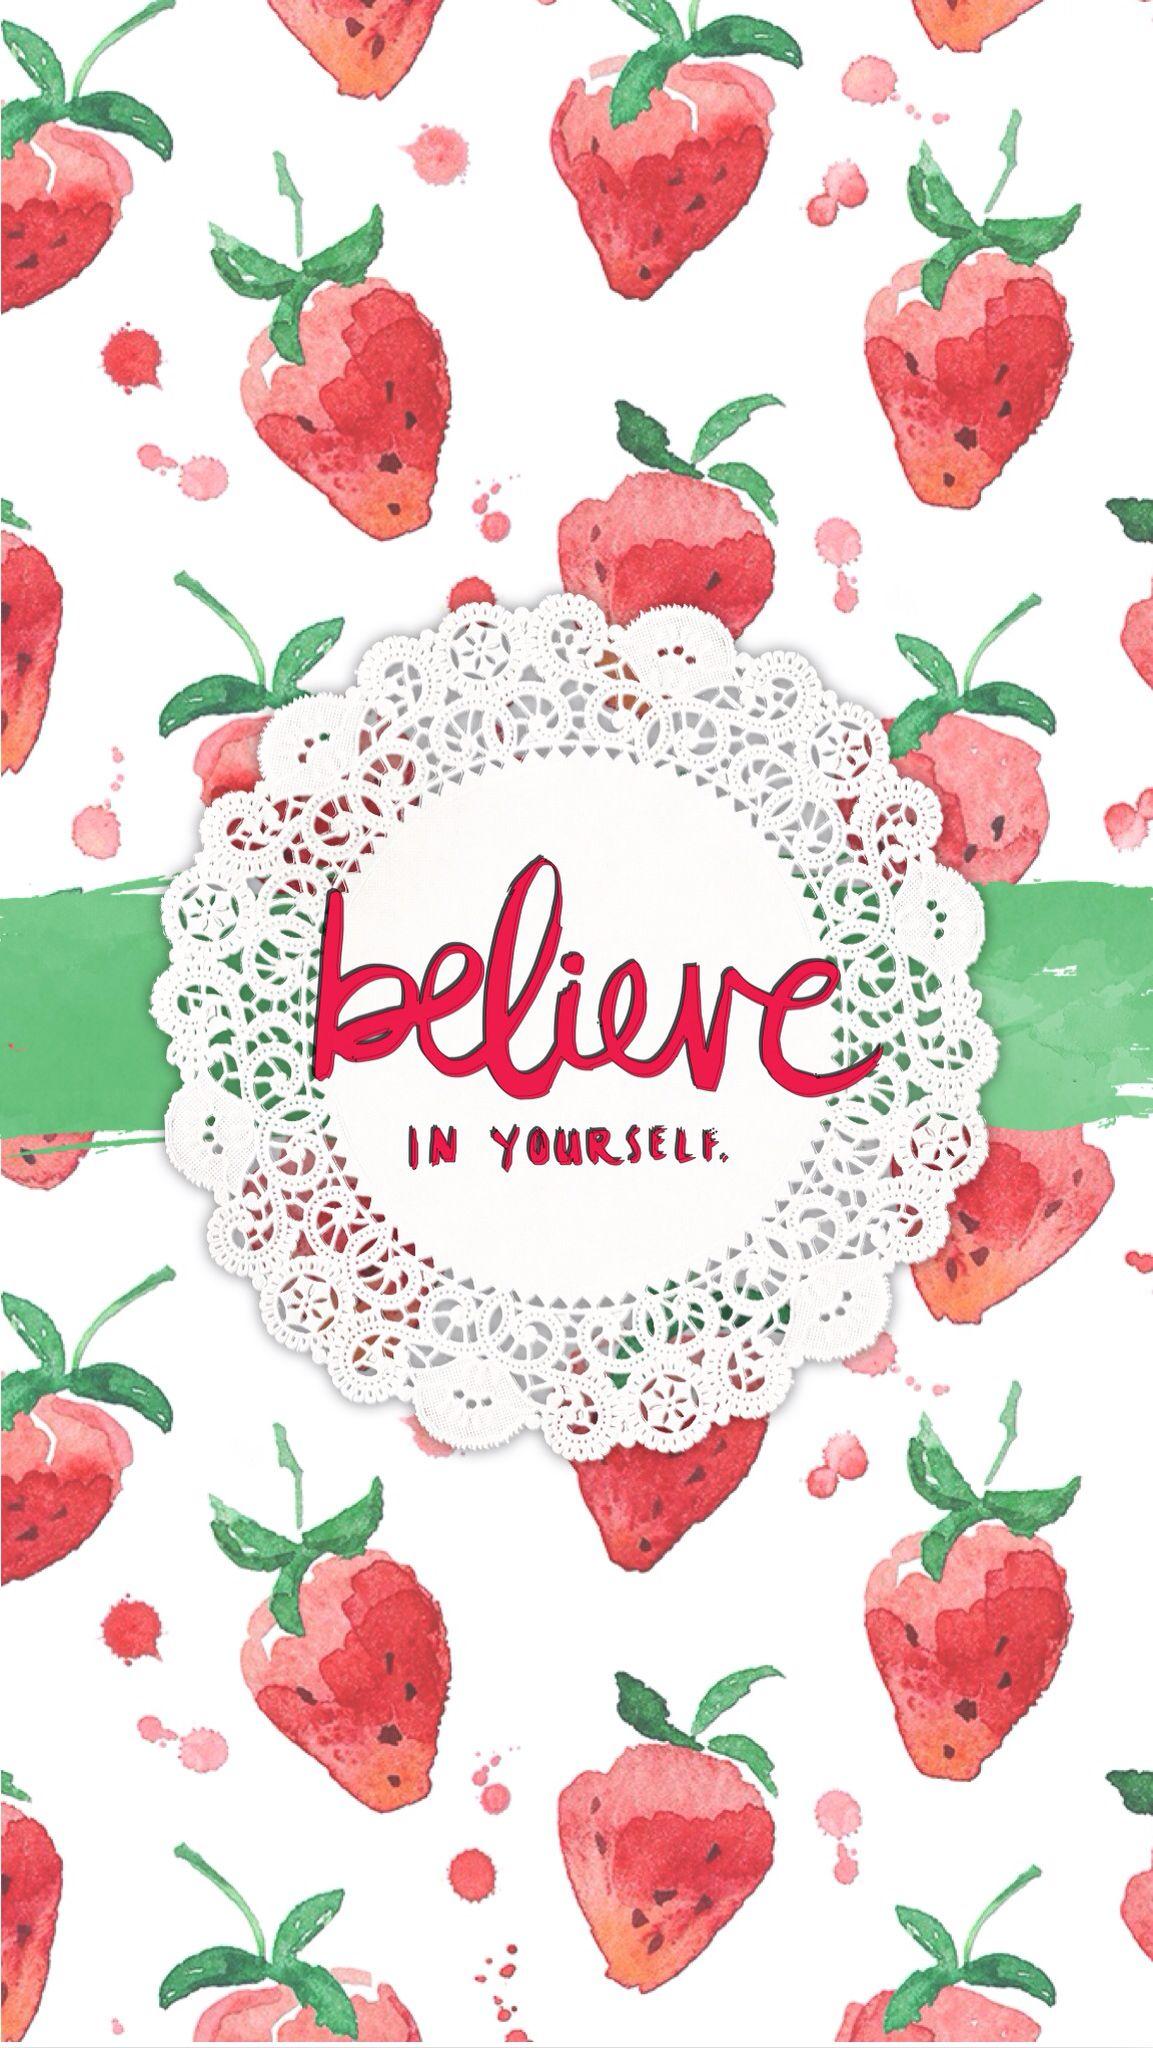 Wallpaper Iphone壁紙 春の苺いちごイチゴ祭り Naver まとめ